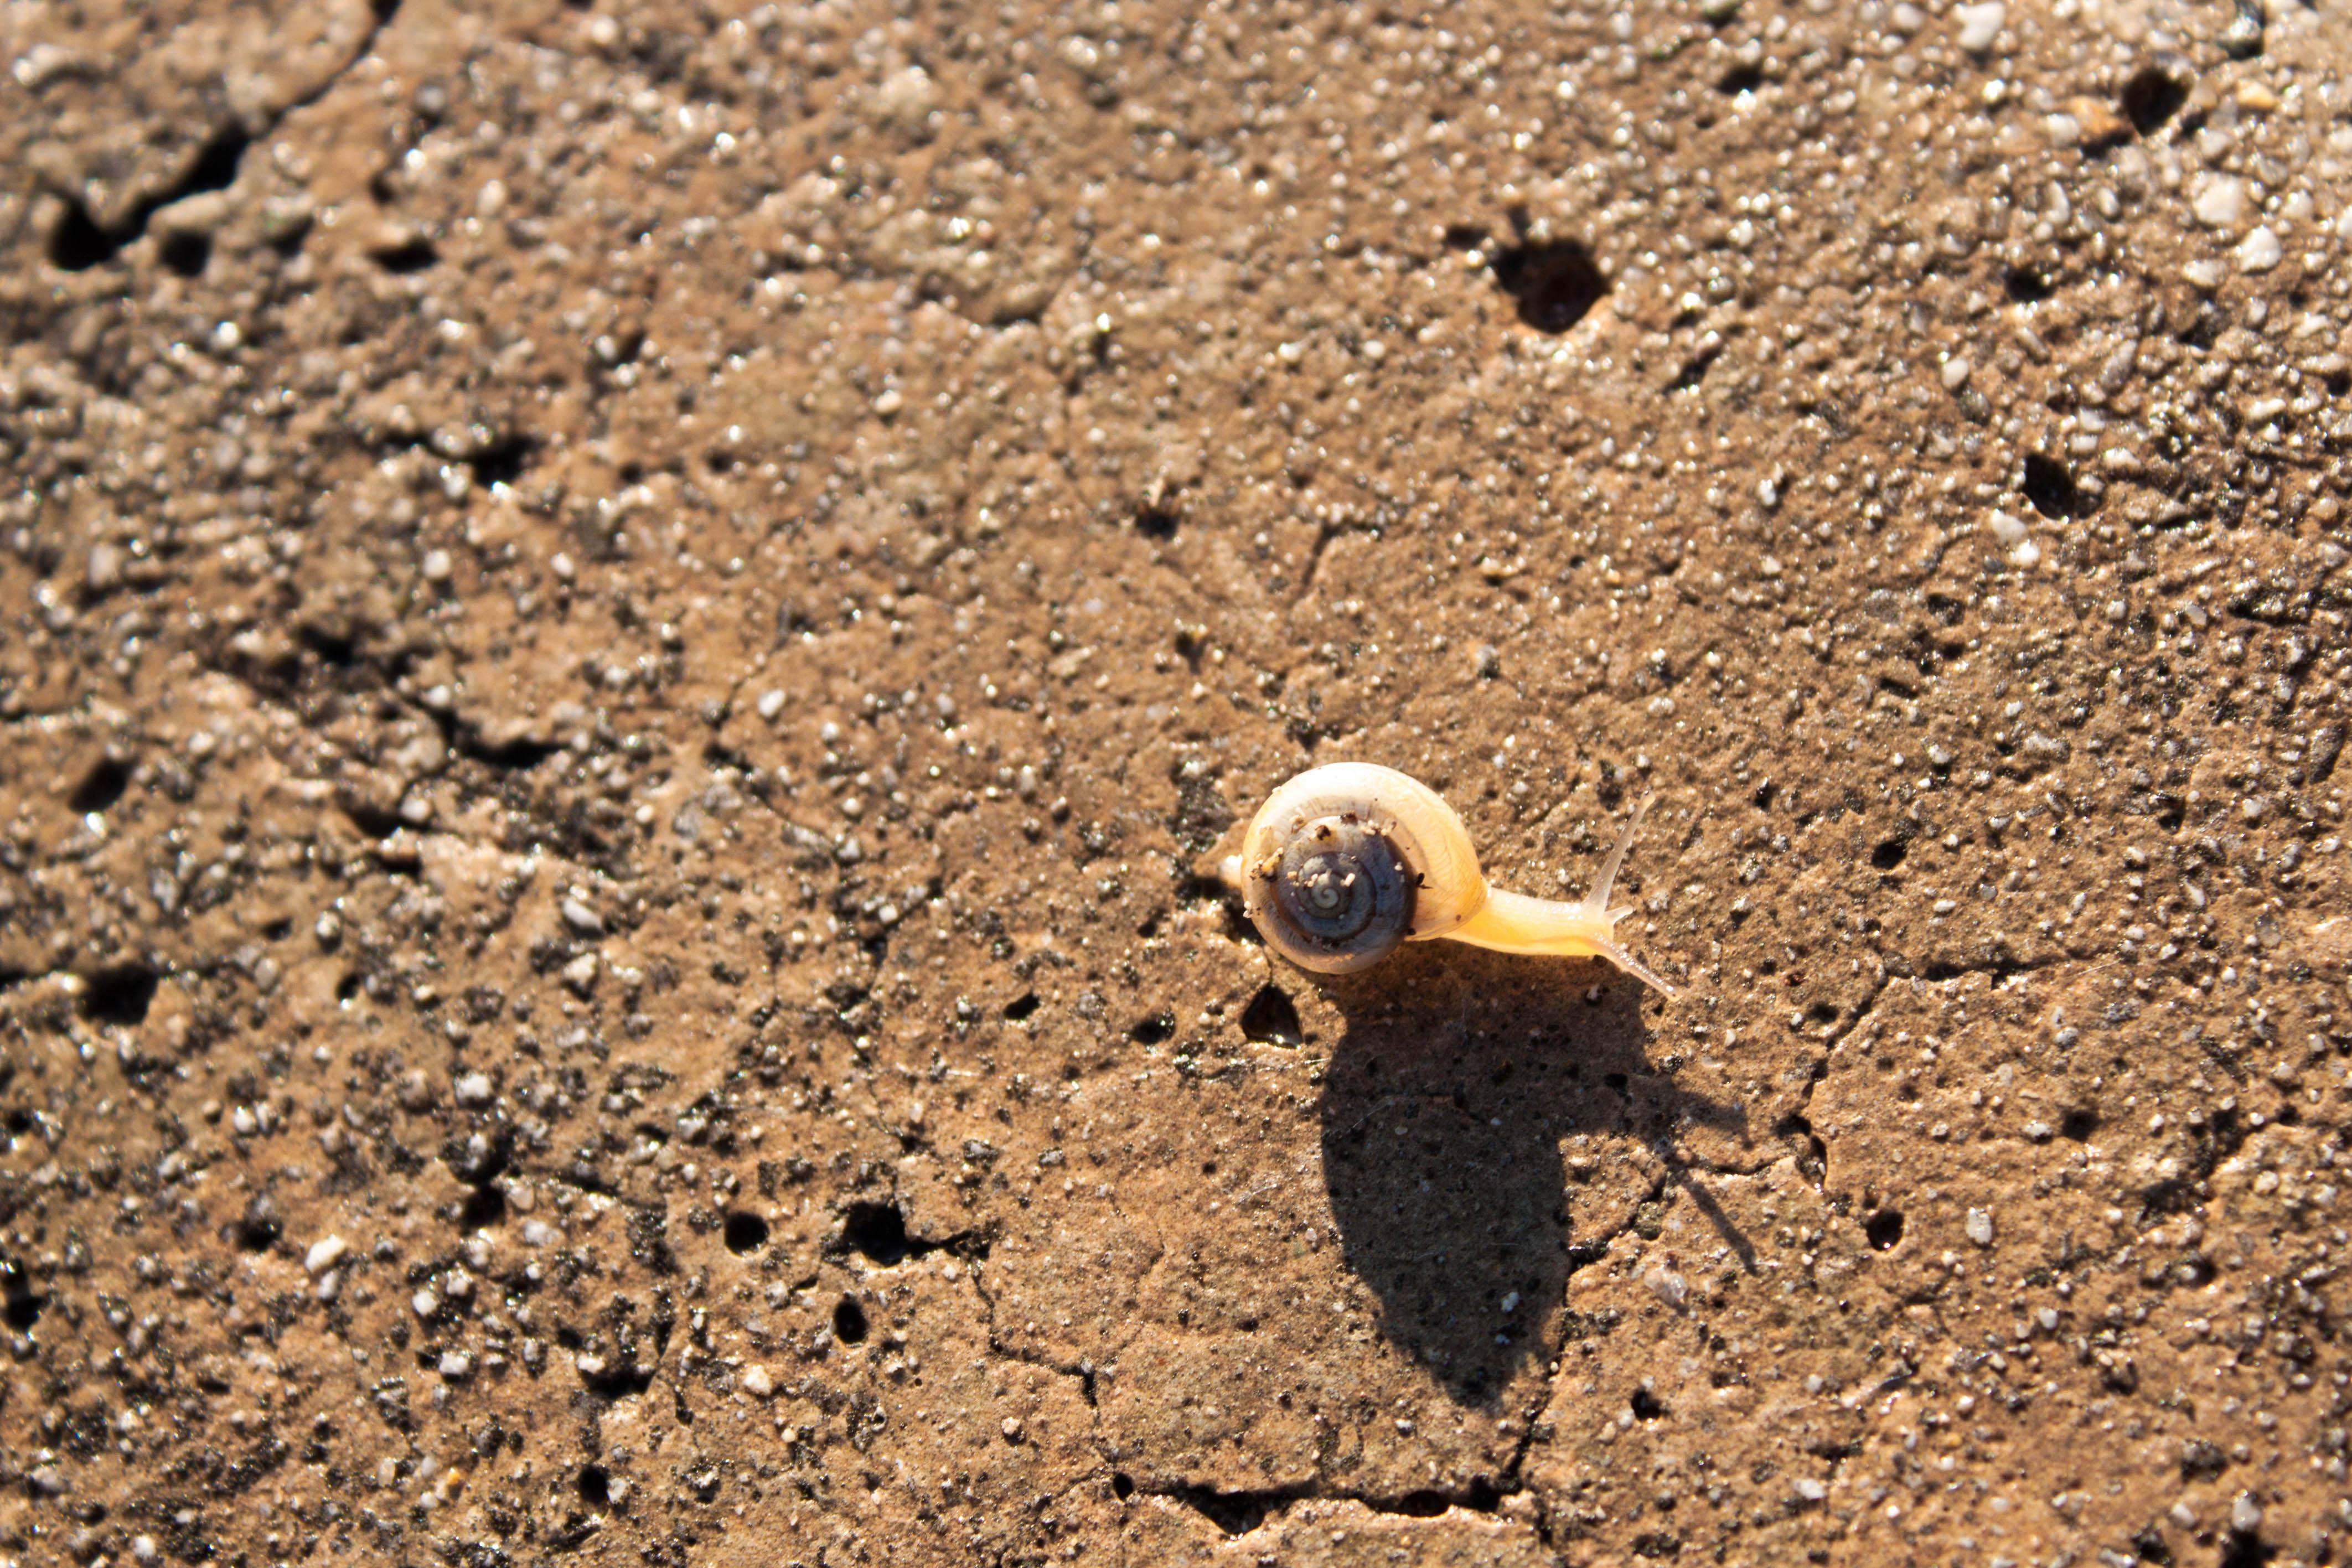 Especie de molusco invertebrado (Foto: Jorge Ricardo)